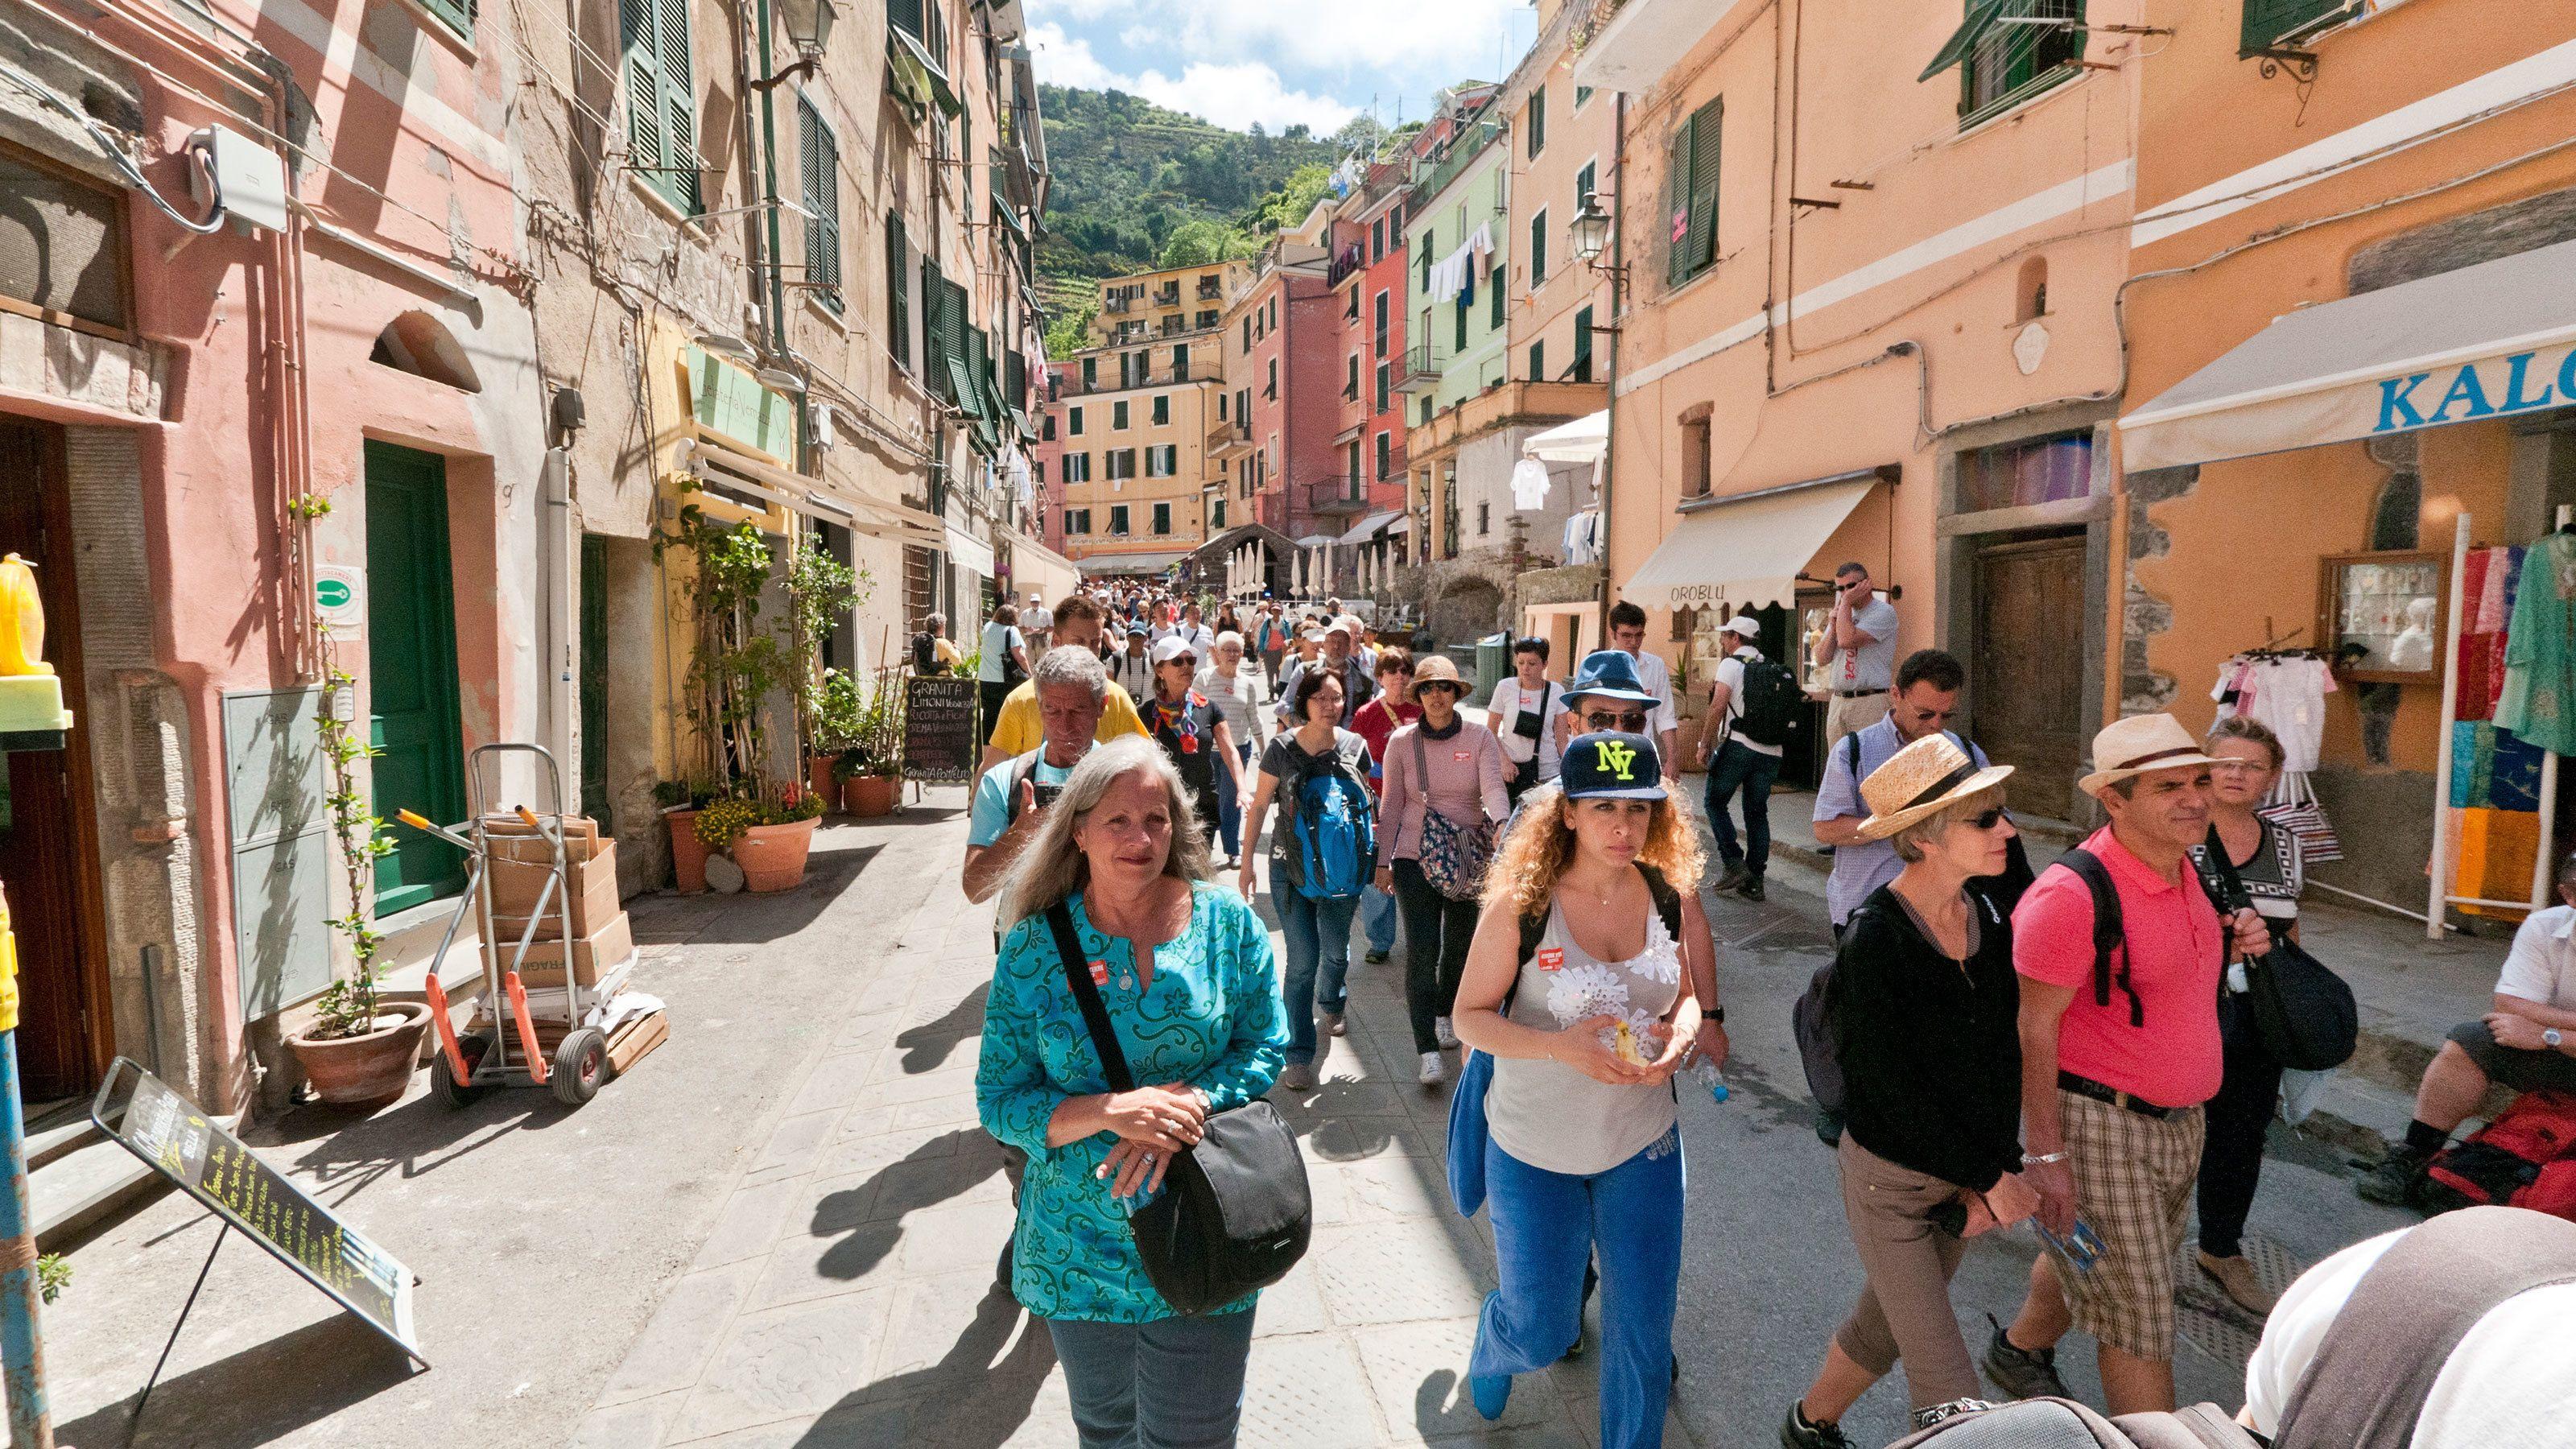 Italian pedestrians walk through city streets